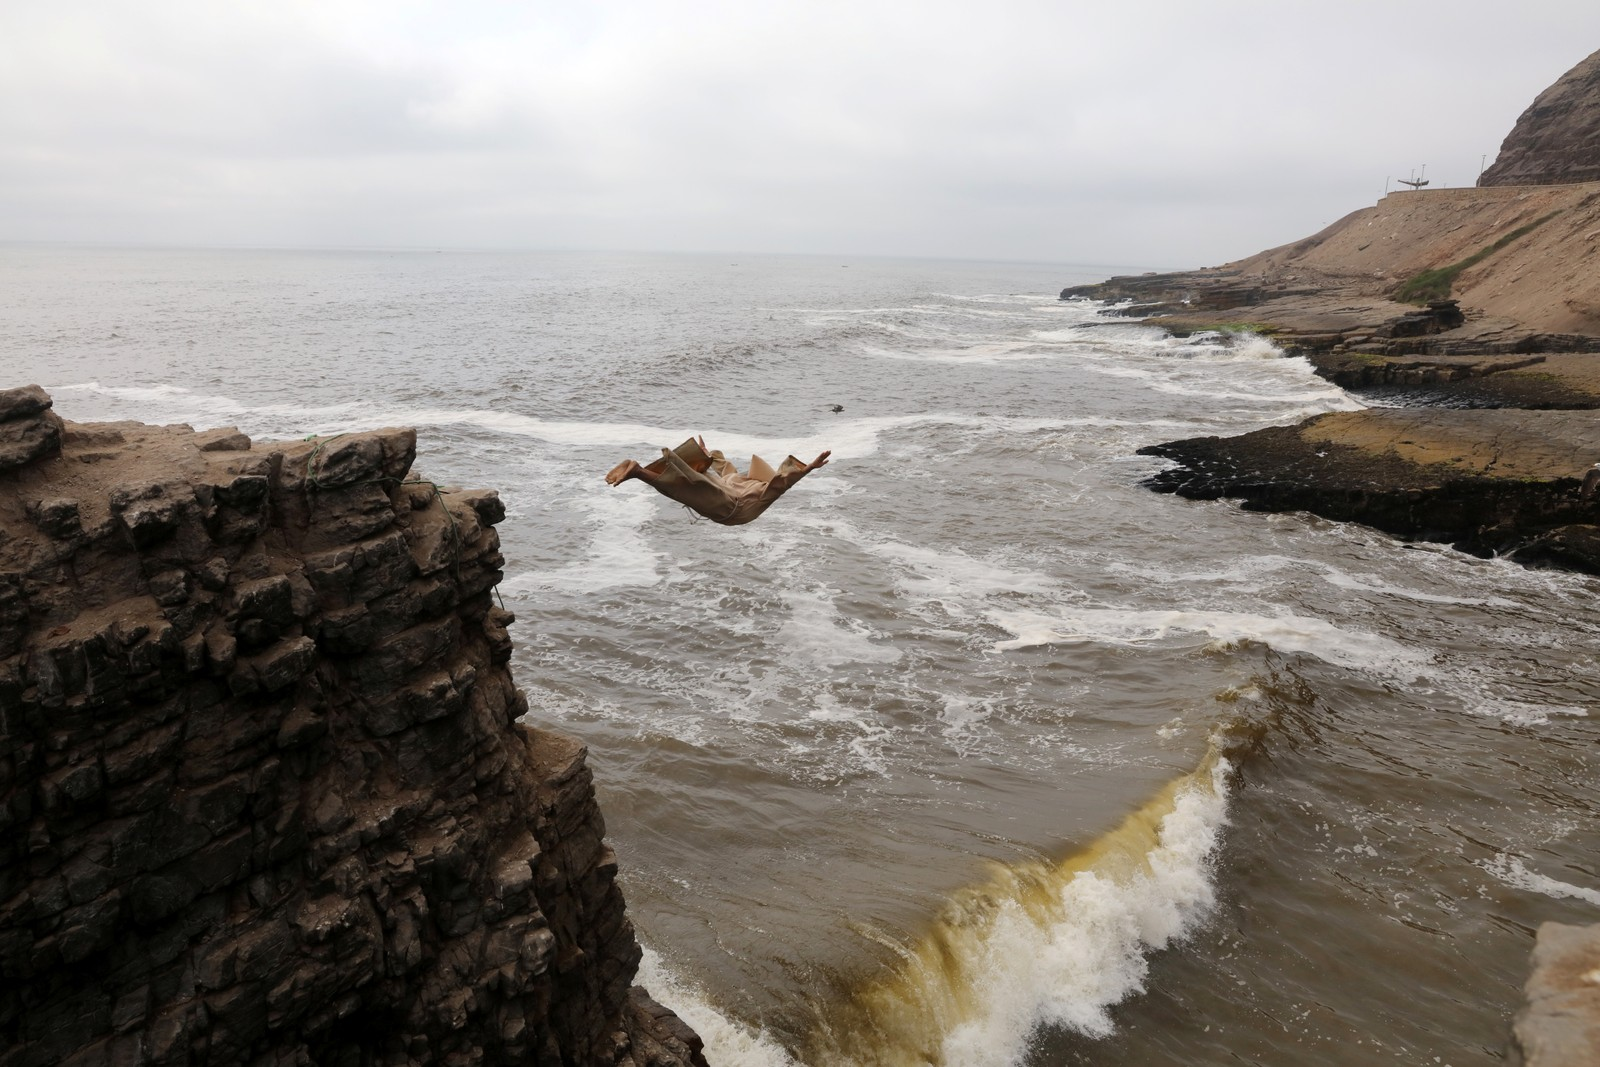 Utkledd som prest stupte Fernando Jesus Canchari seg utfor de 13 meter høye klippene ved Herradura-stranda i Lima, Peru.